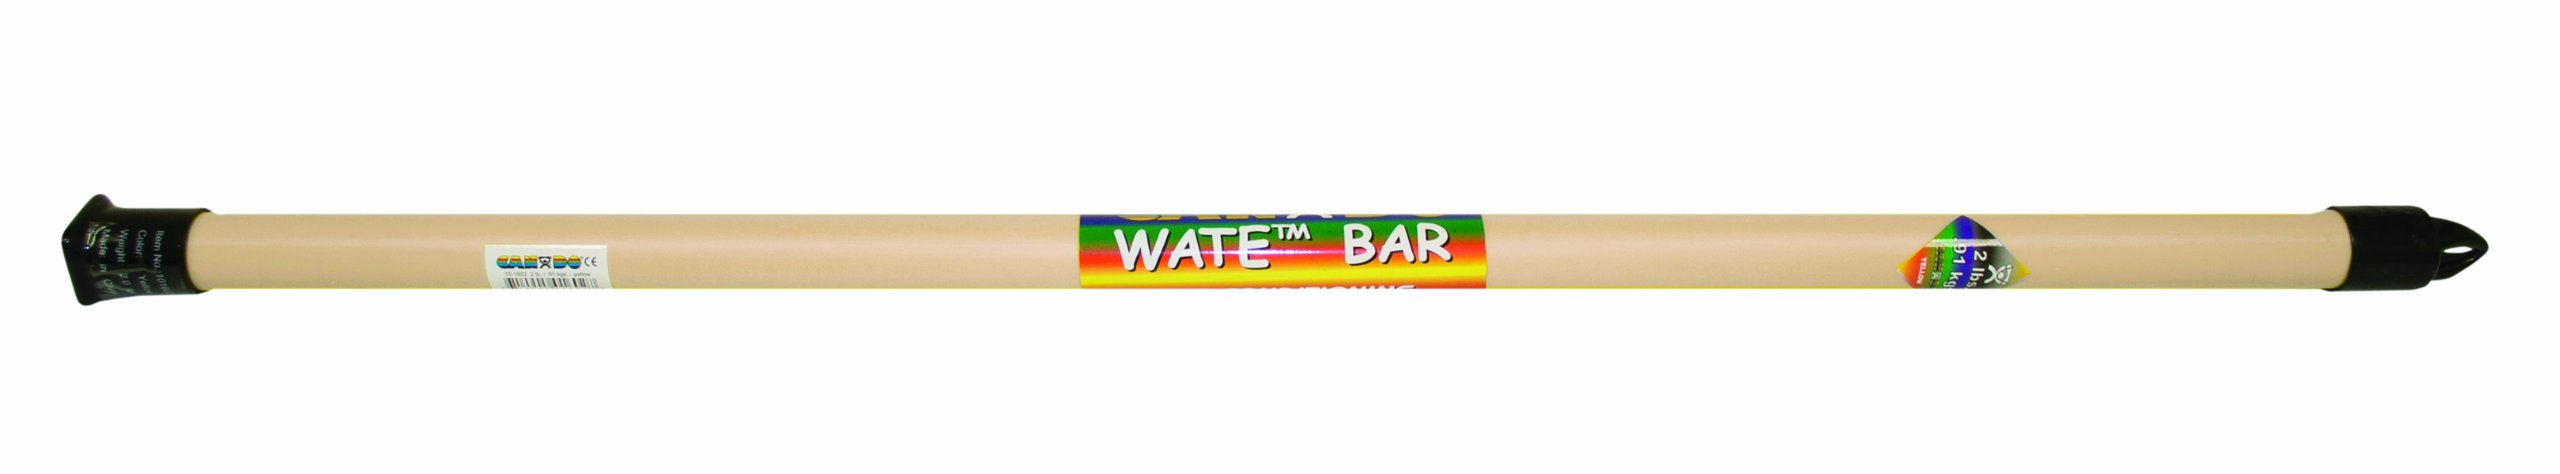 Cando Exercise Wate Bar, 1 lbs Weight, Tan